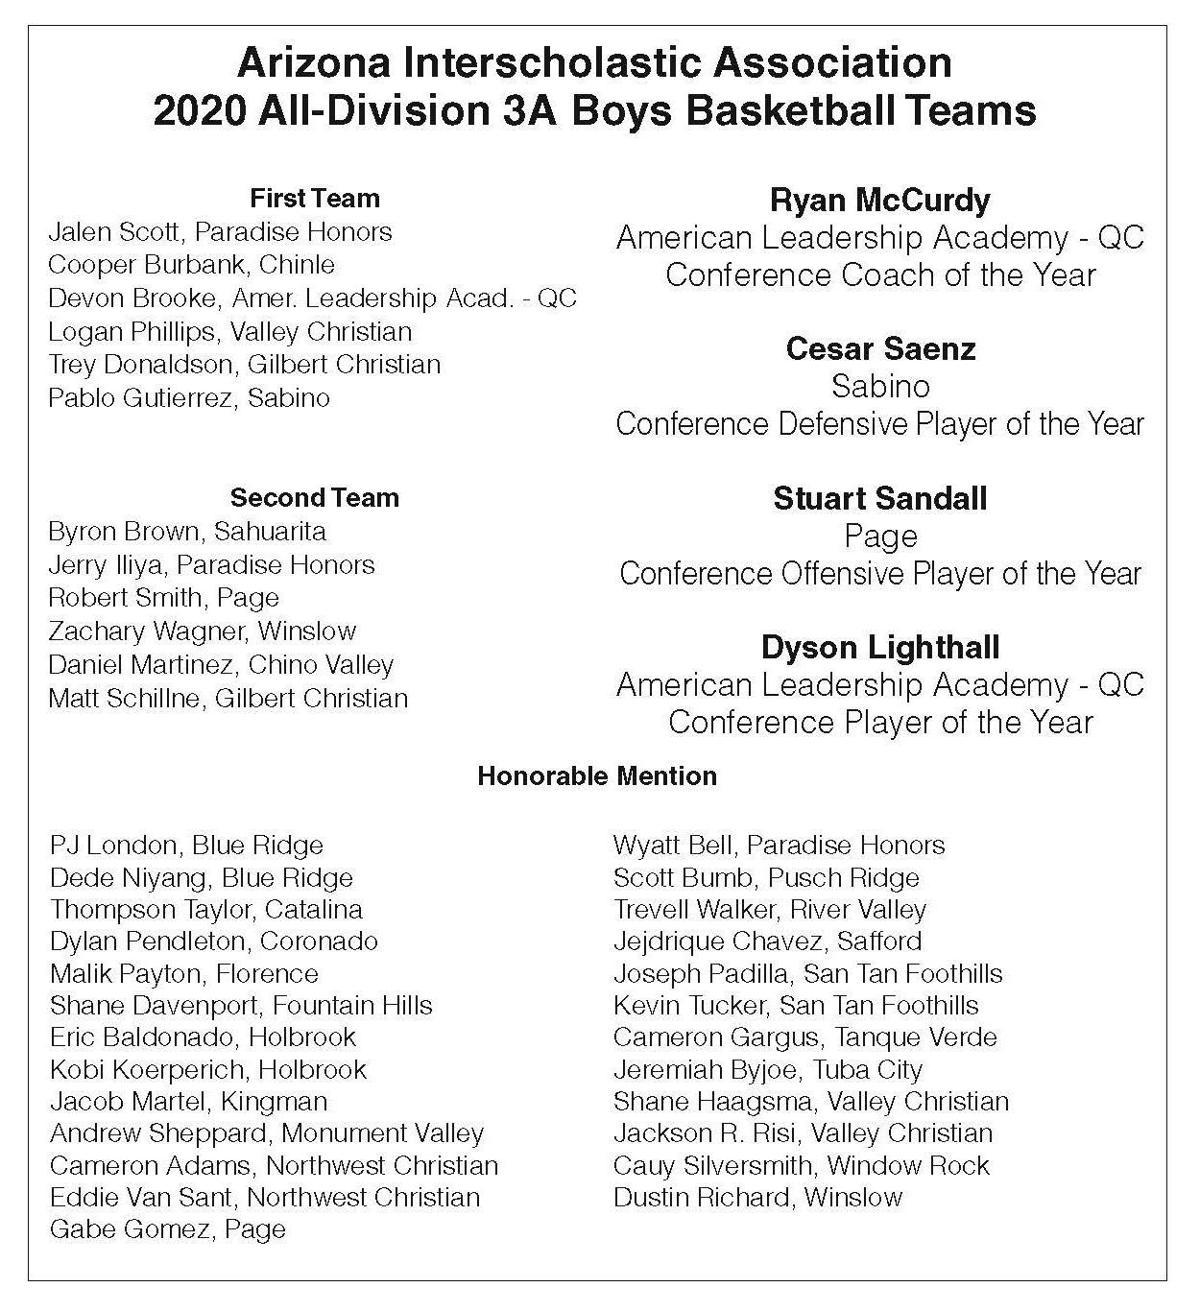 AIA 2020 All 3A Basketball